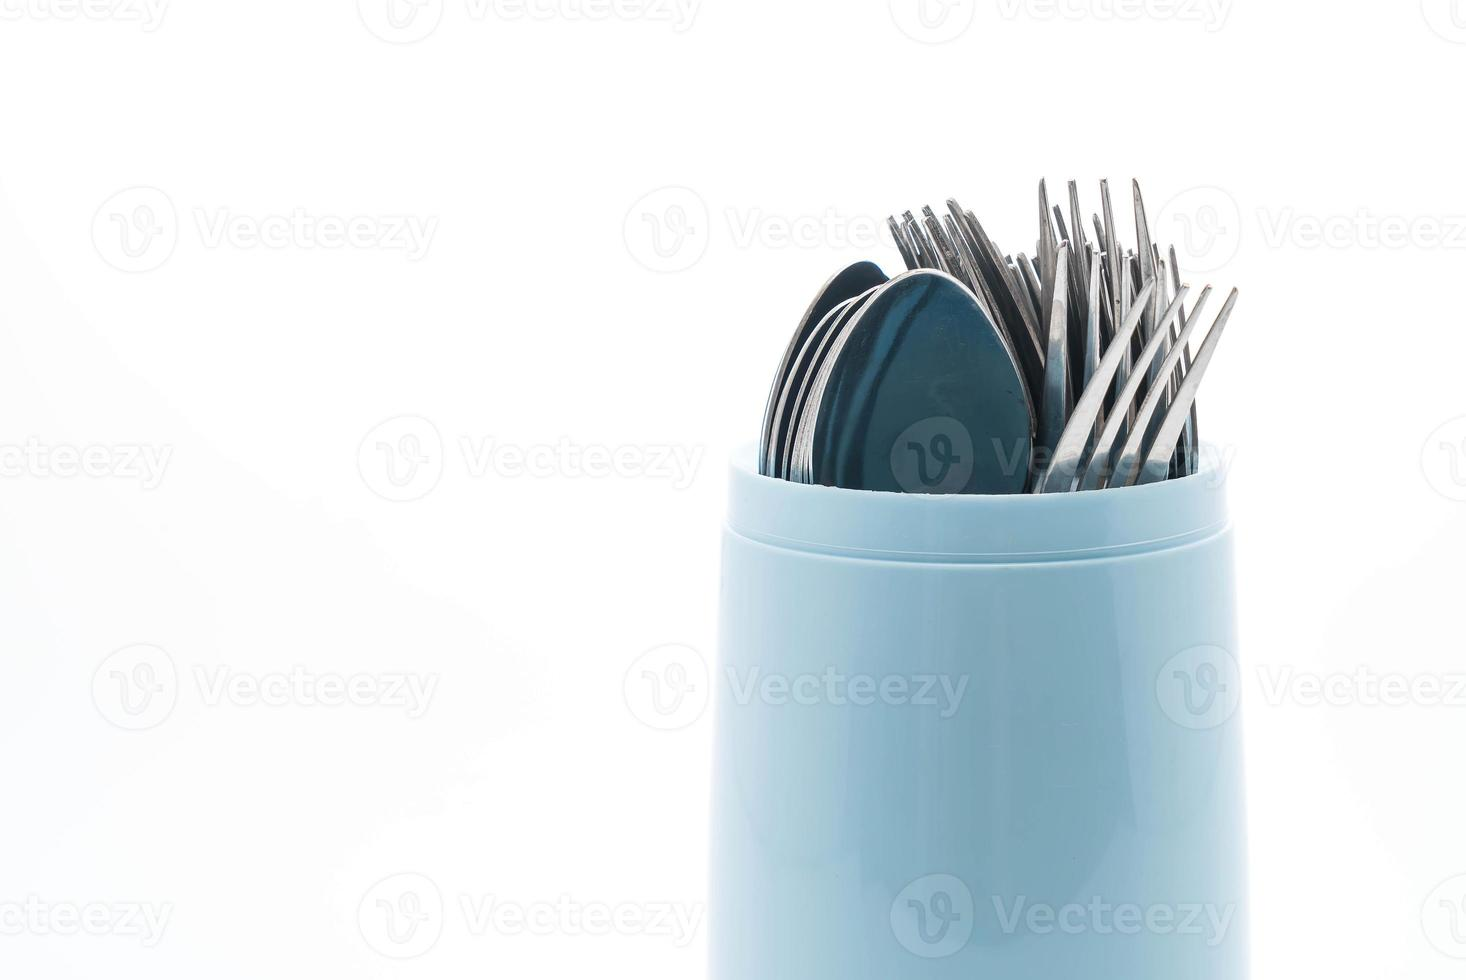 Cutlery holder on white background photo